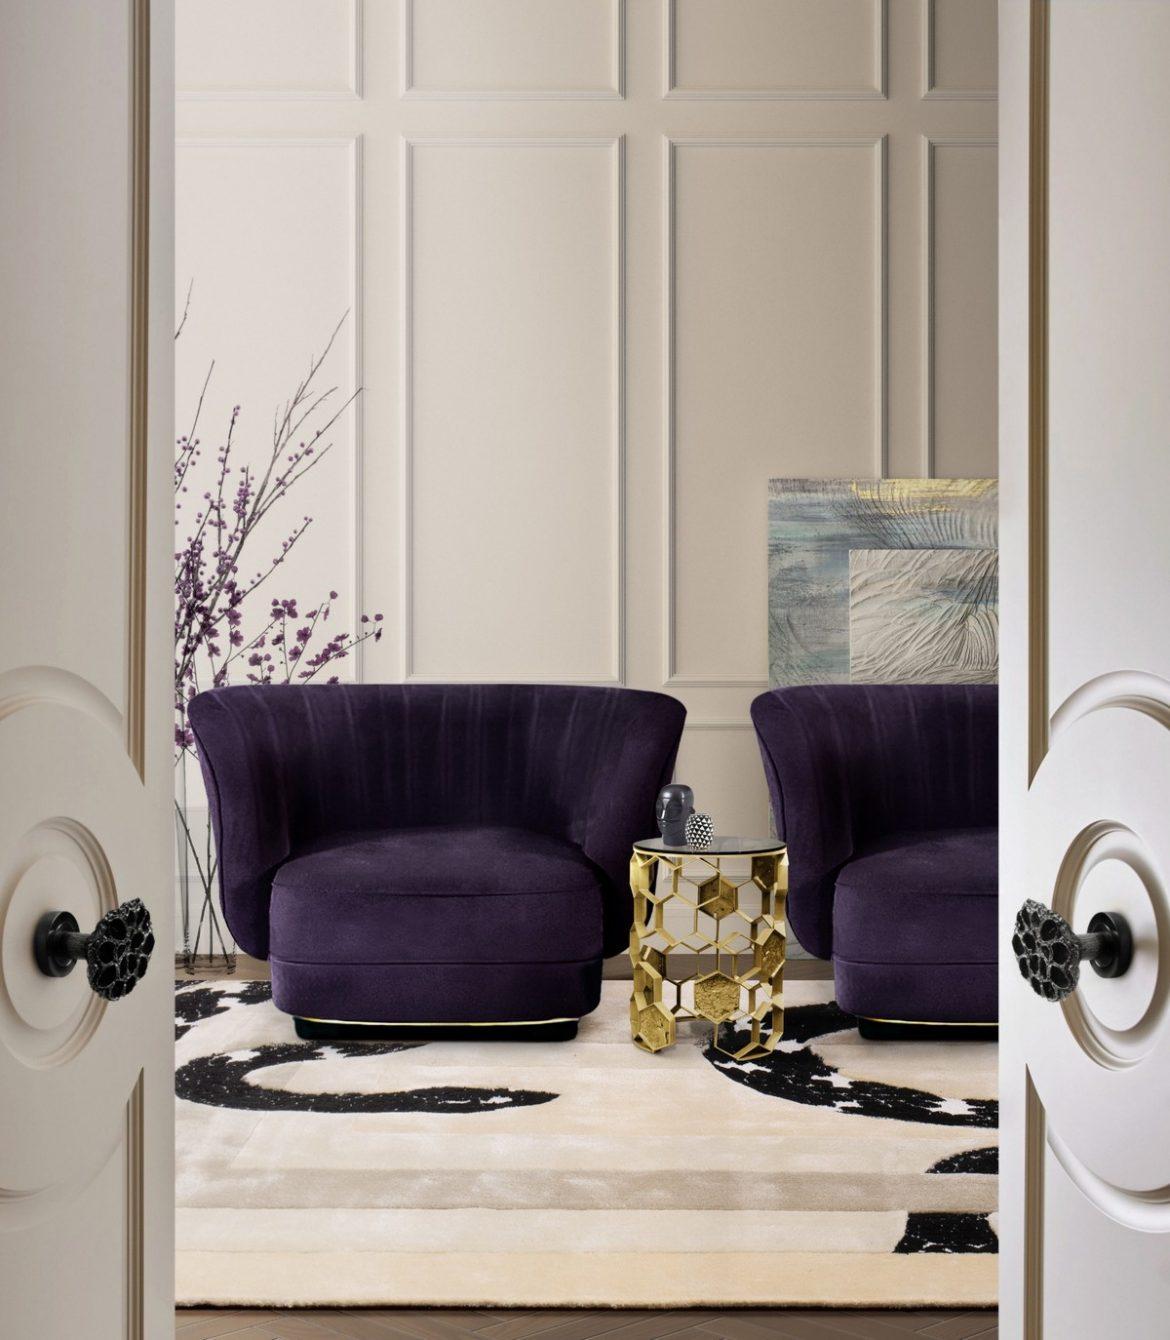 living room ideas Living Room Ideas: TOP 5 Armchairs living room ideas armchairs 3